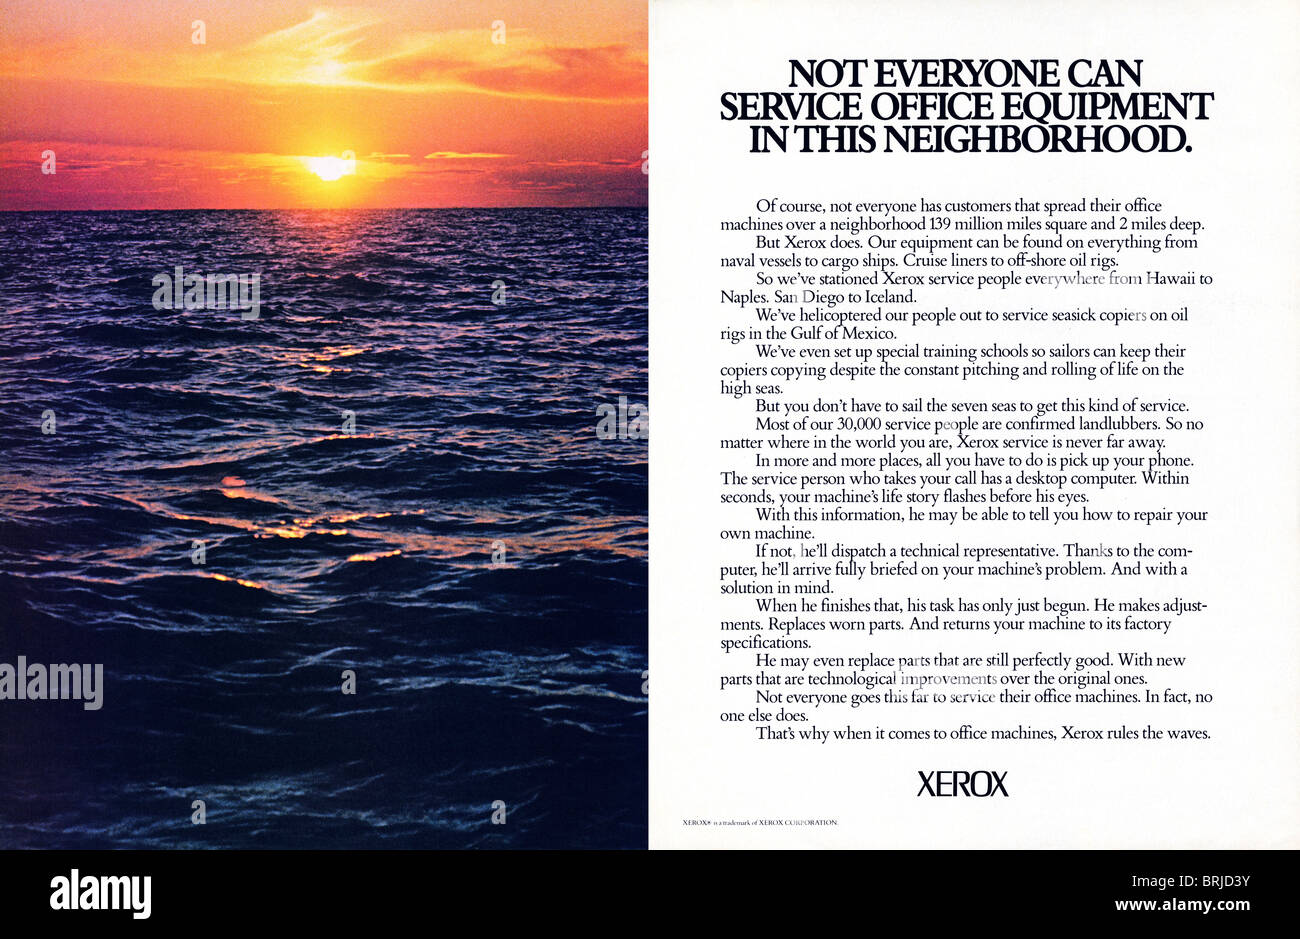 Color Double Page Spread Advert For Xerox Copiers In American Fashion  Magazine Circa 1983